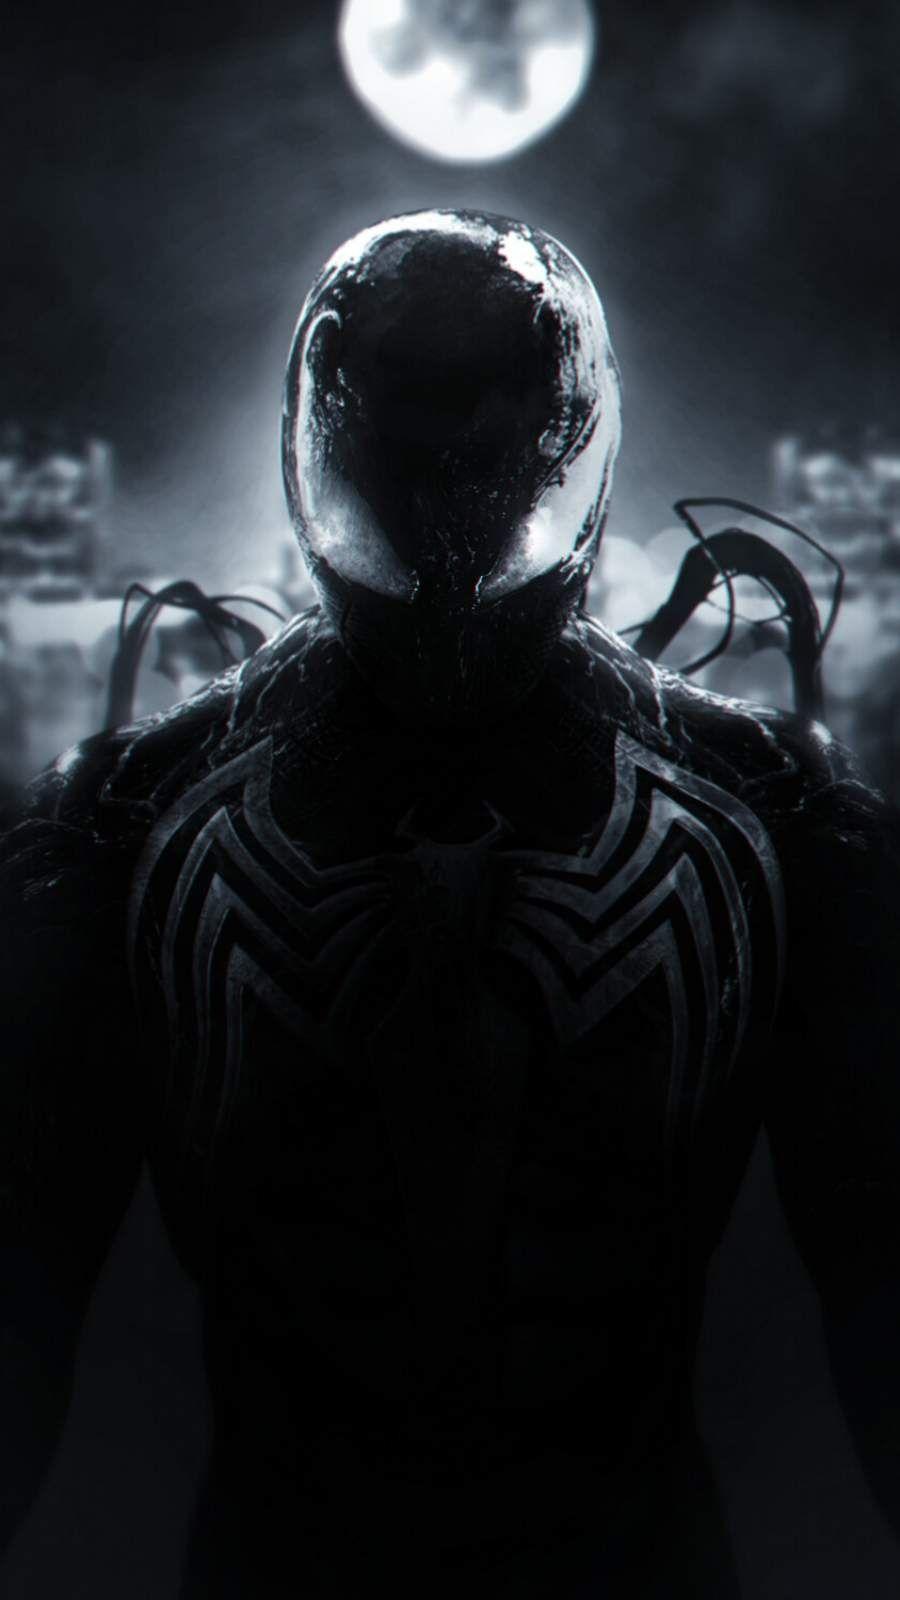 Spider Man Symbiote Iphone Wallpaper Marvel Spiderman Art Symbiote Spiderman Marvel Comics Wallpaper